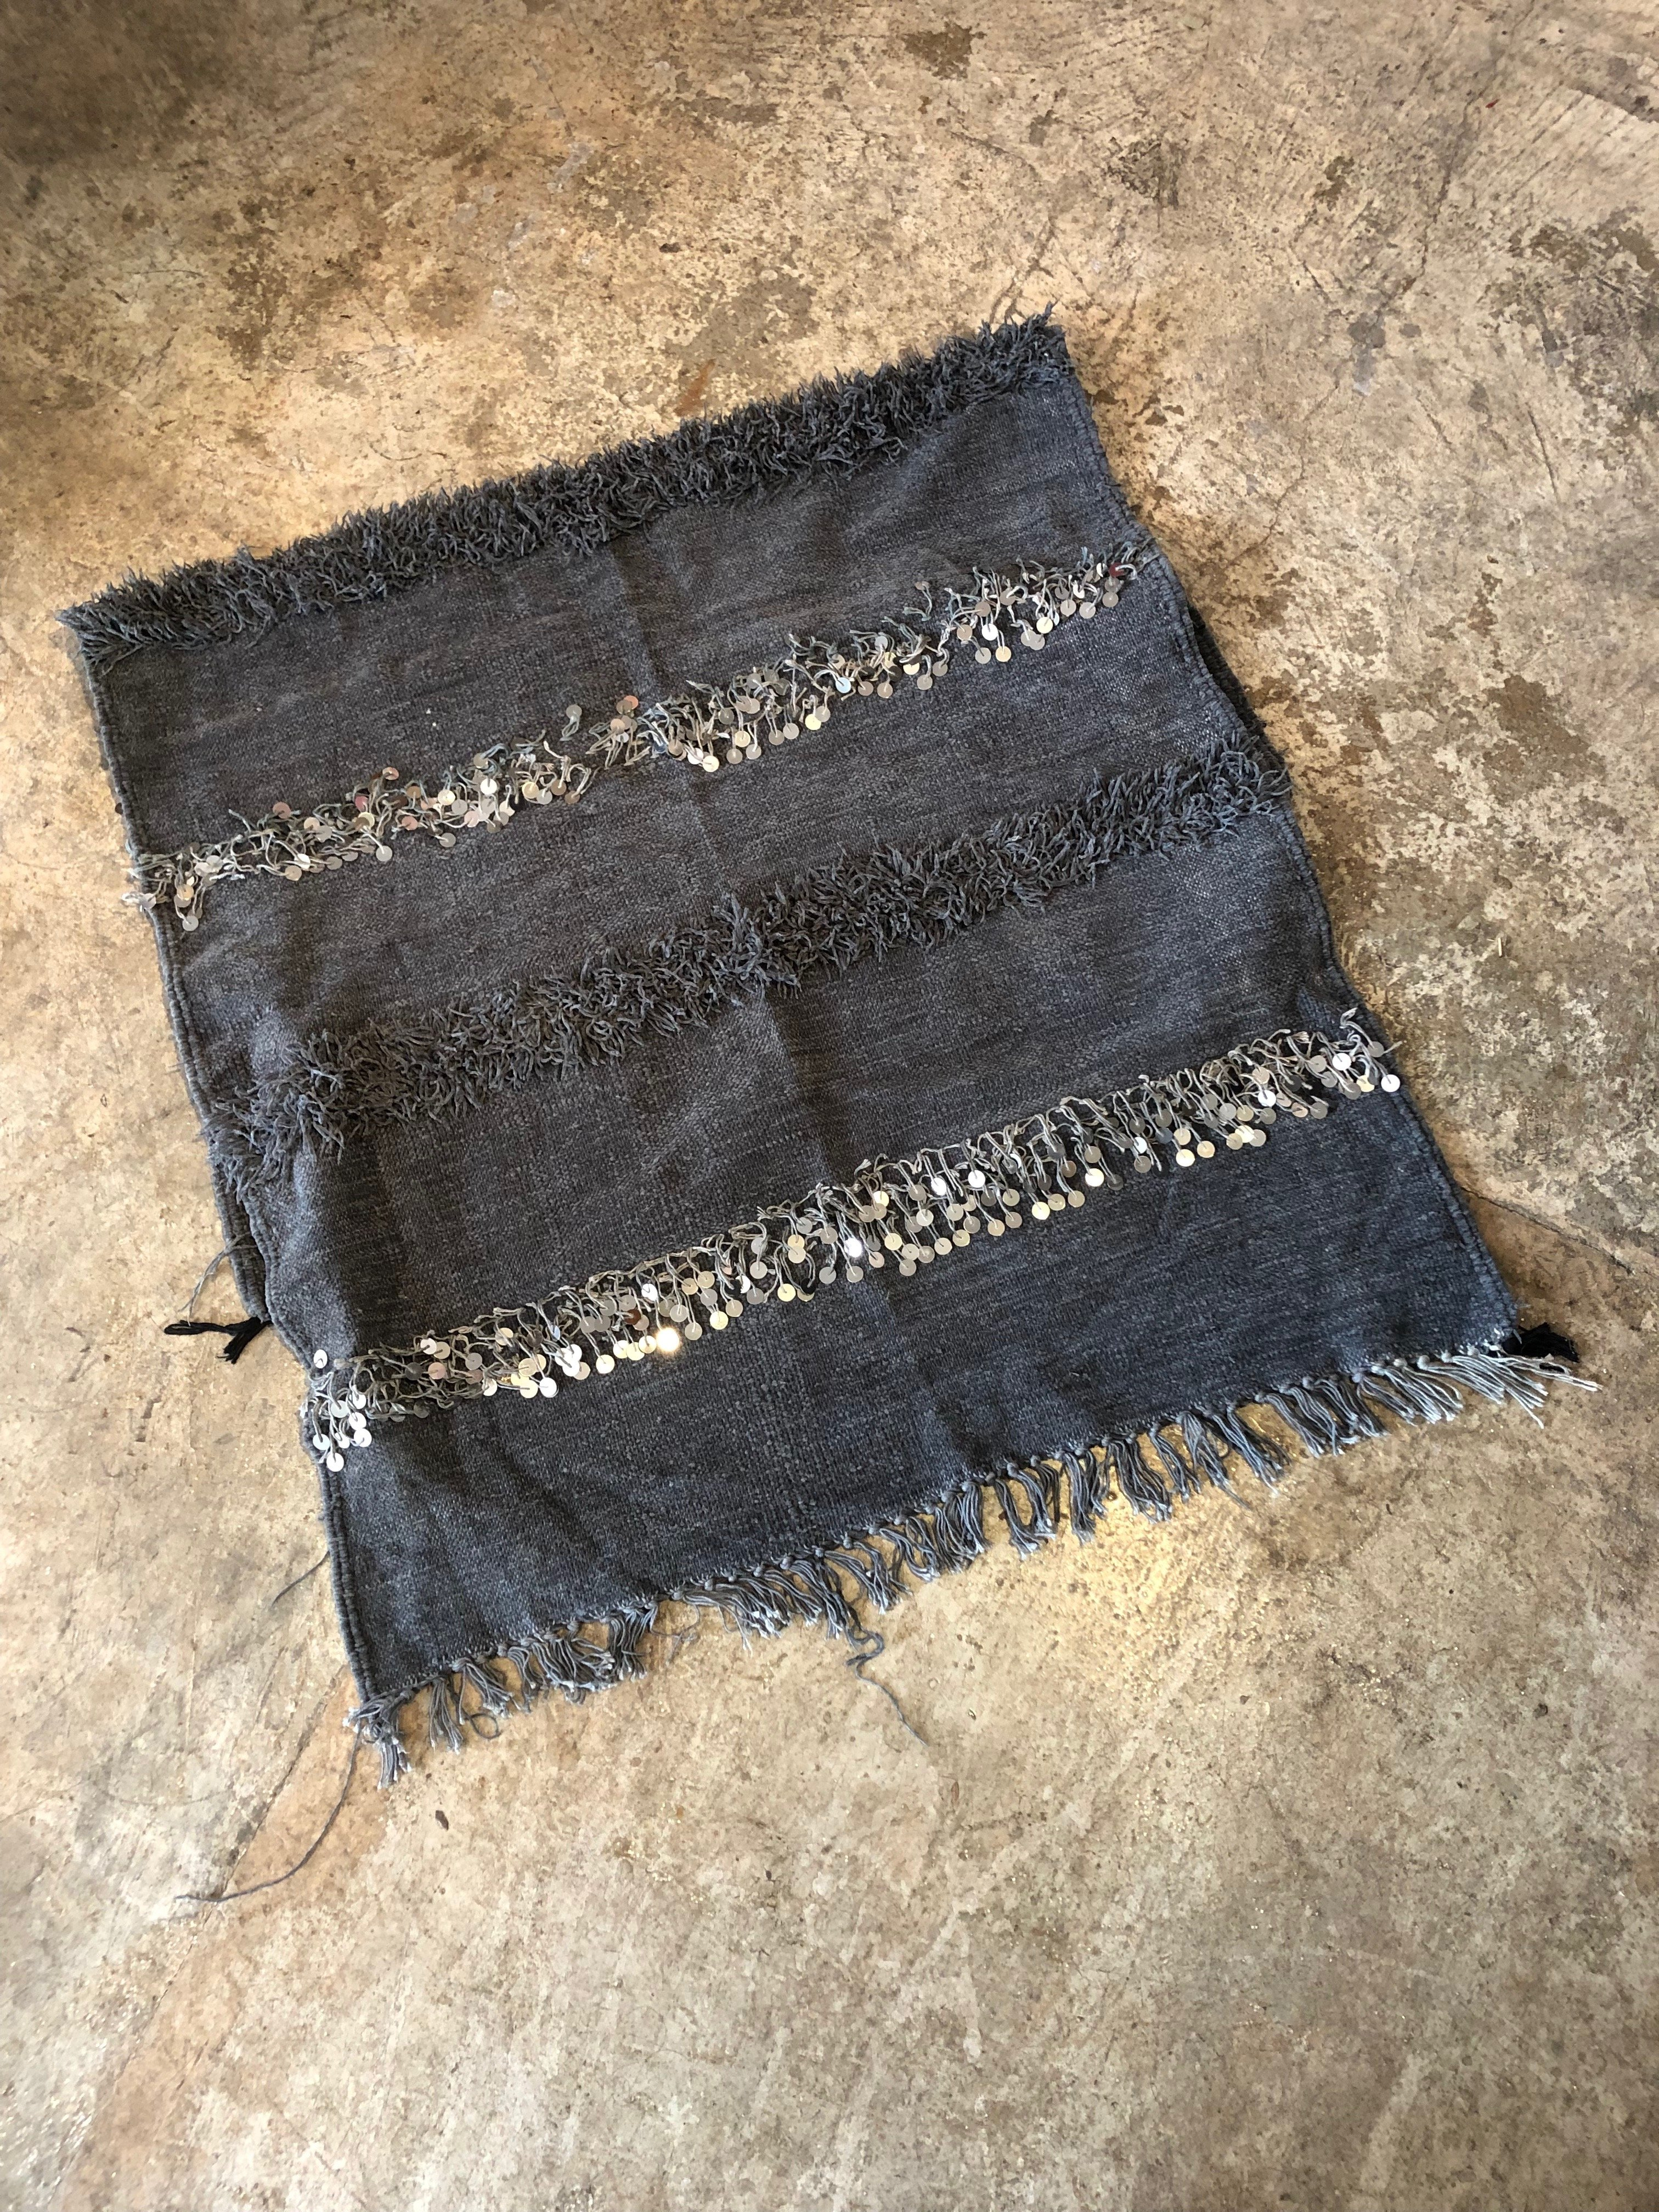 Moroccan Wedding Blanket.Vintage Small Moroccan Wedding Blanket Blue